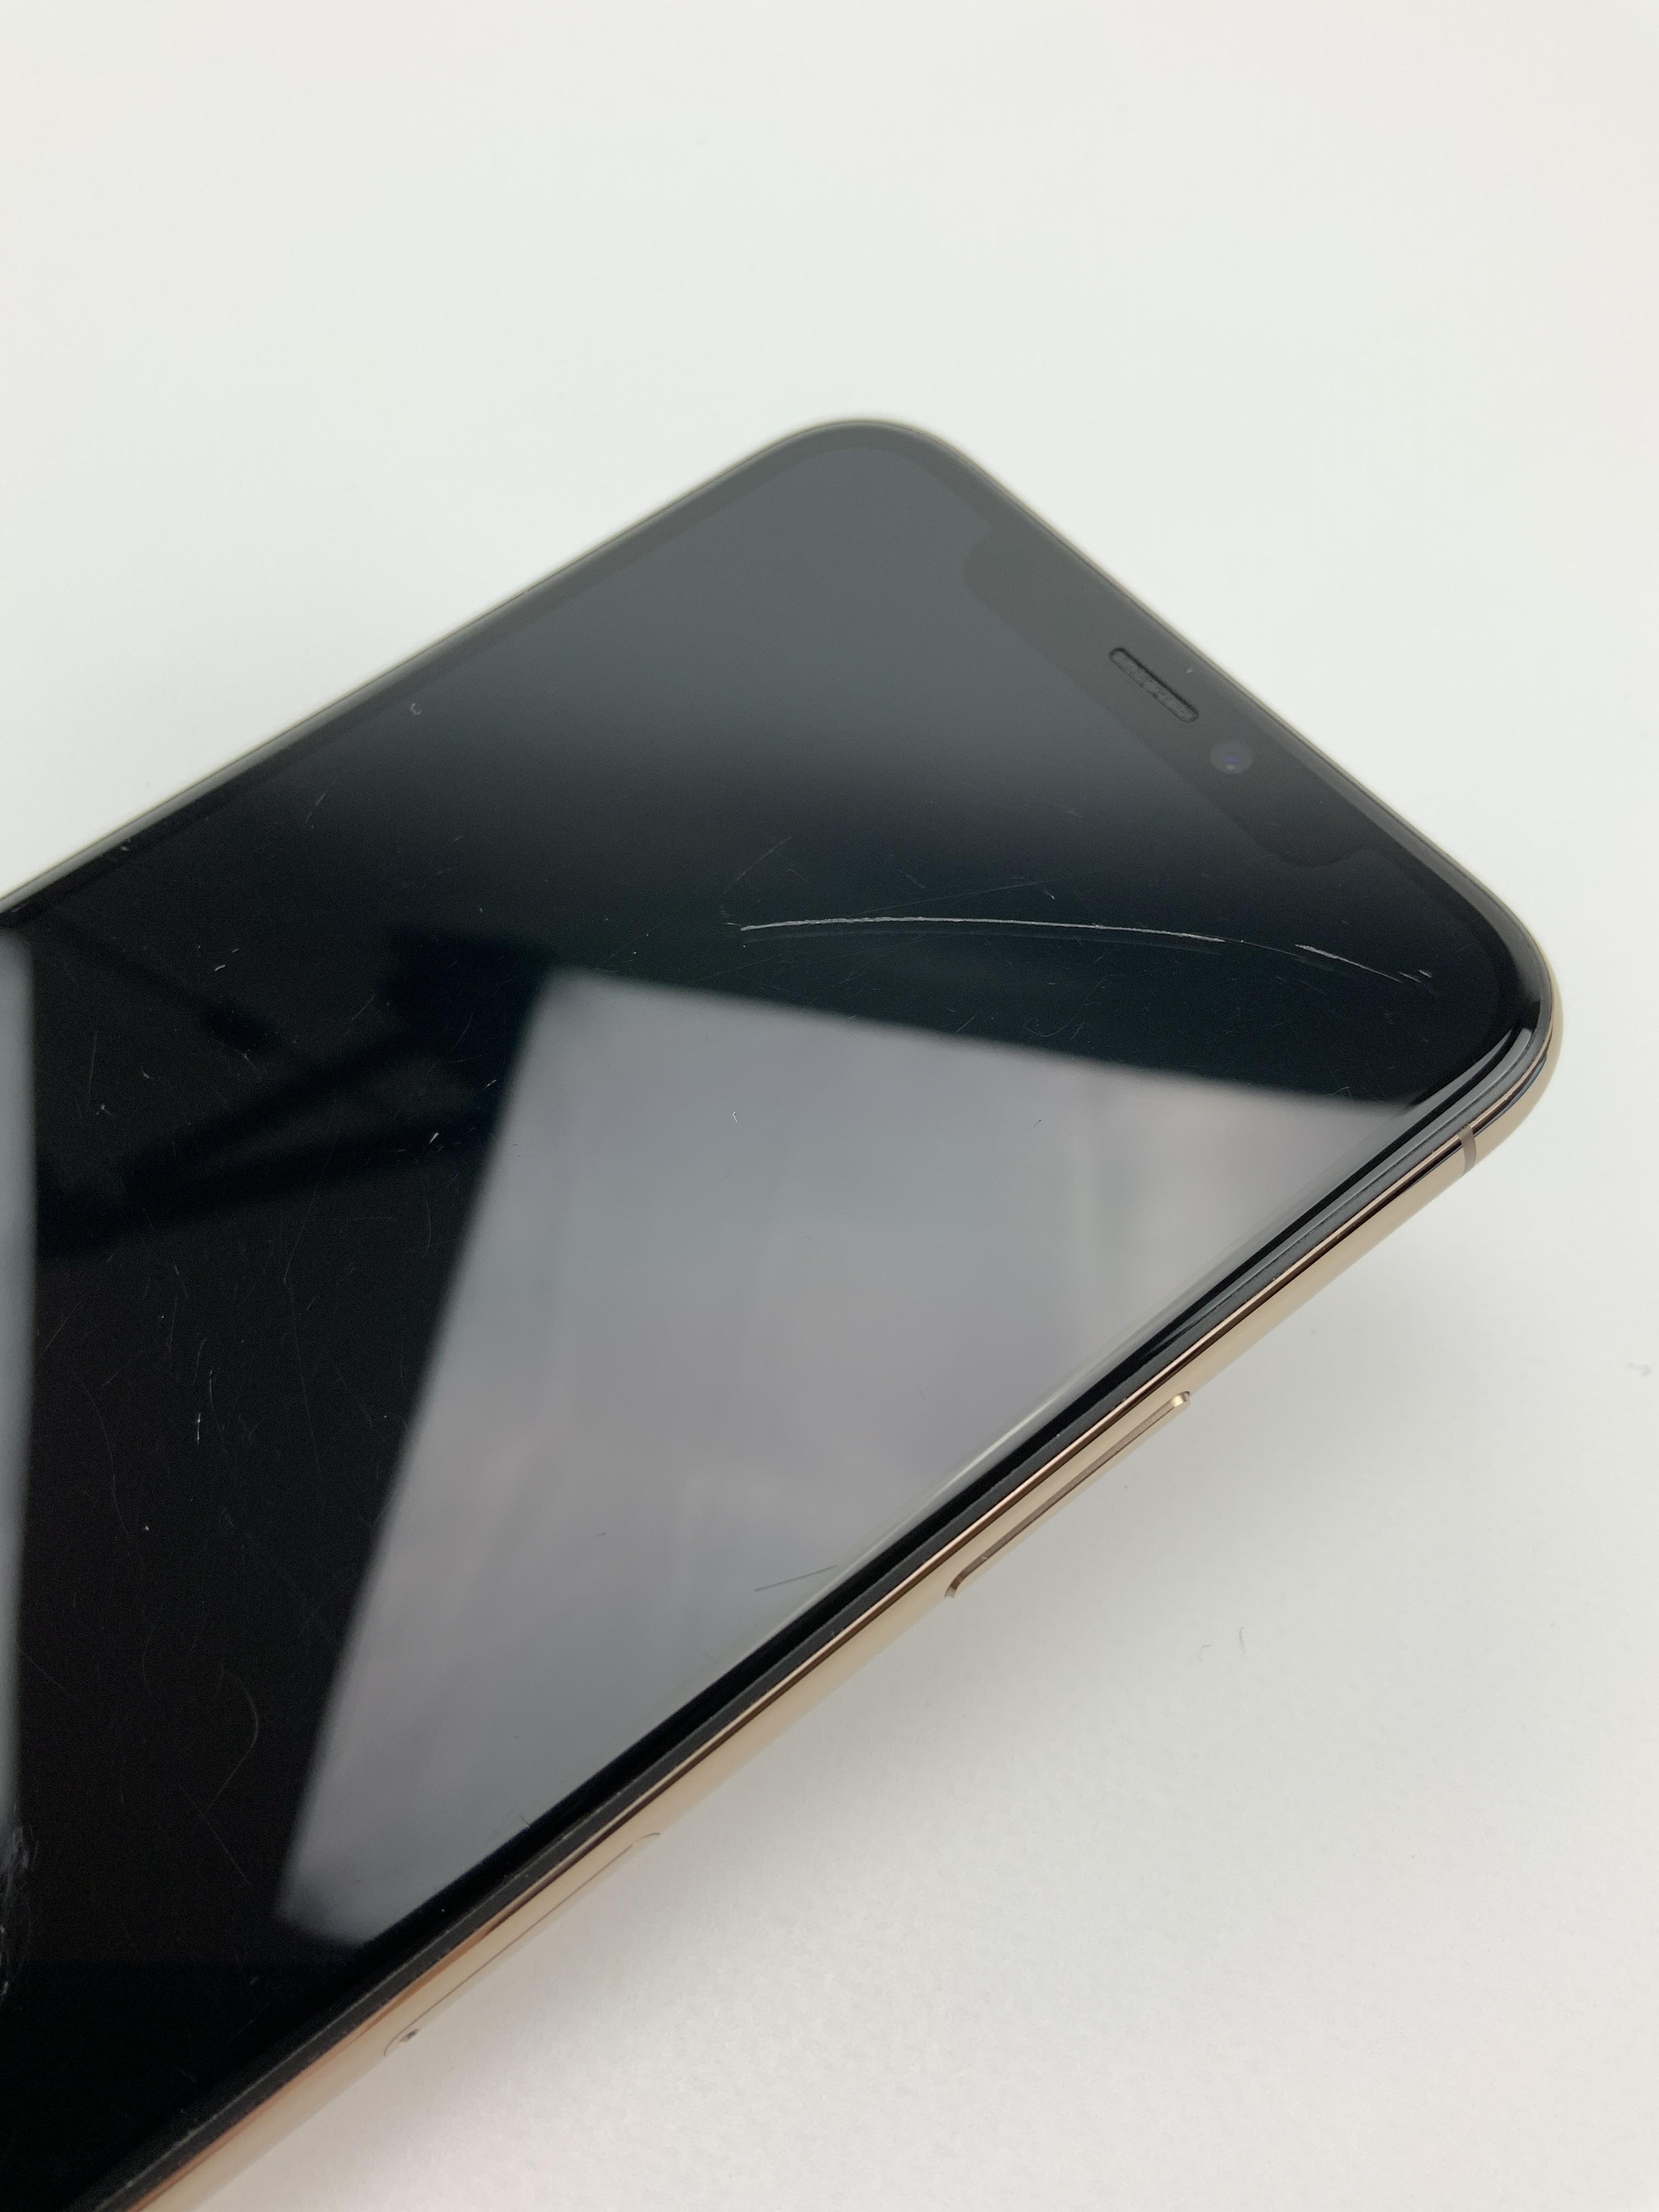 iPhone 11 Pro 64GB, 64GB, Gold, image 3